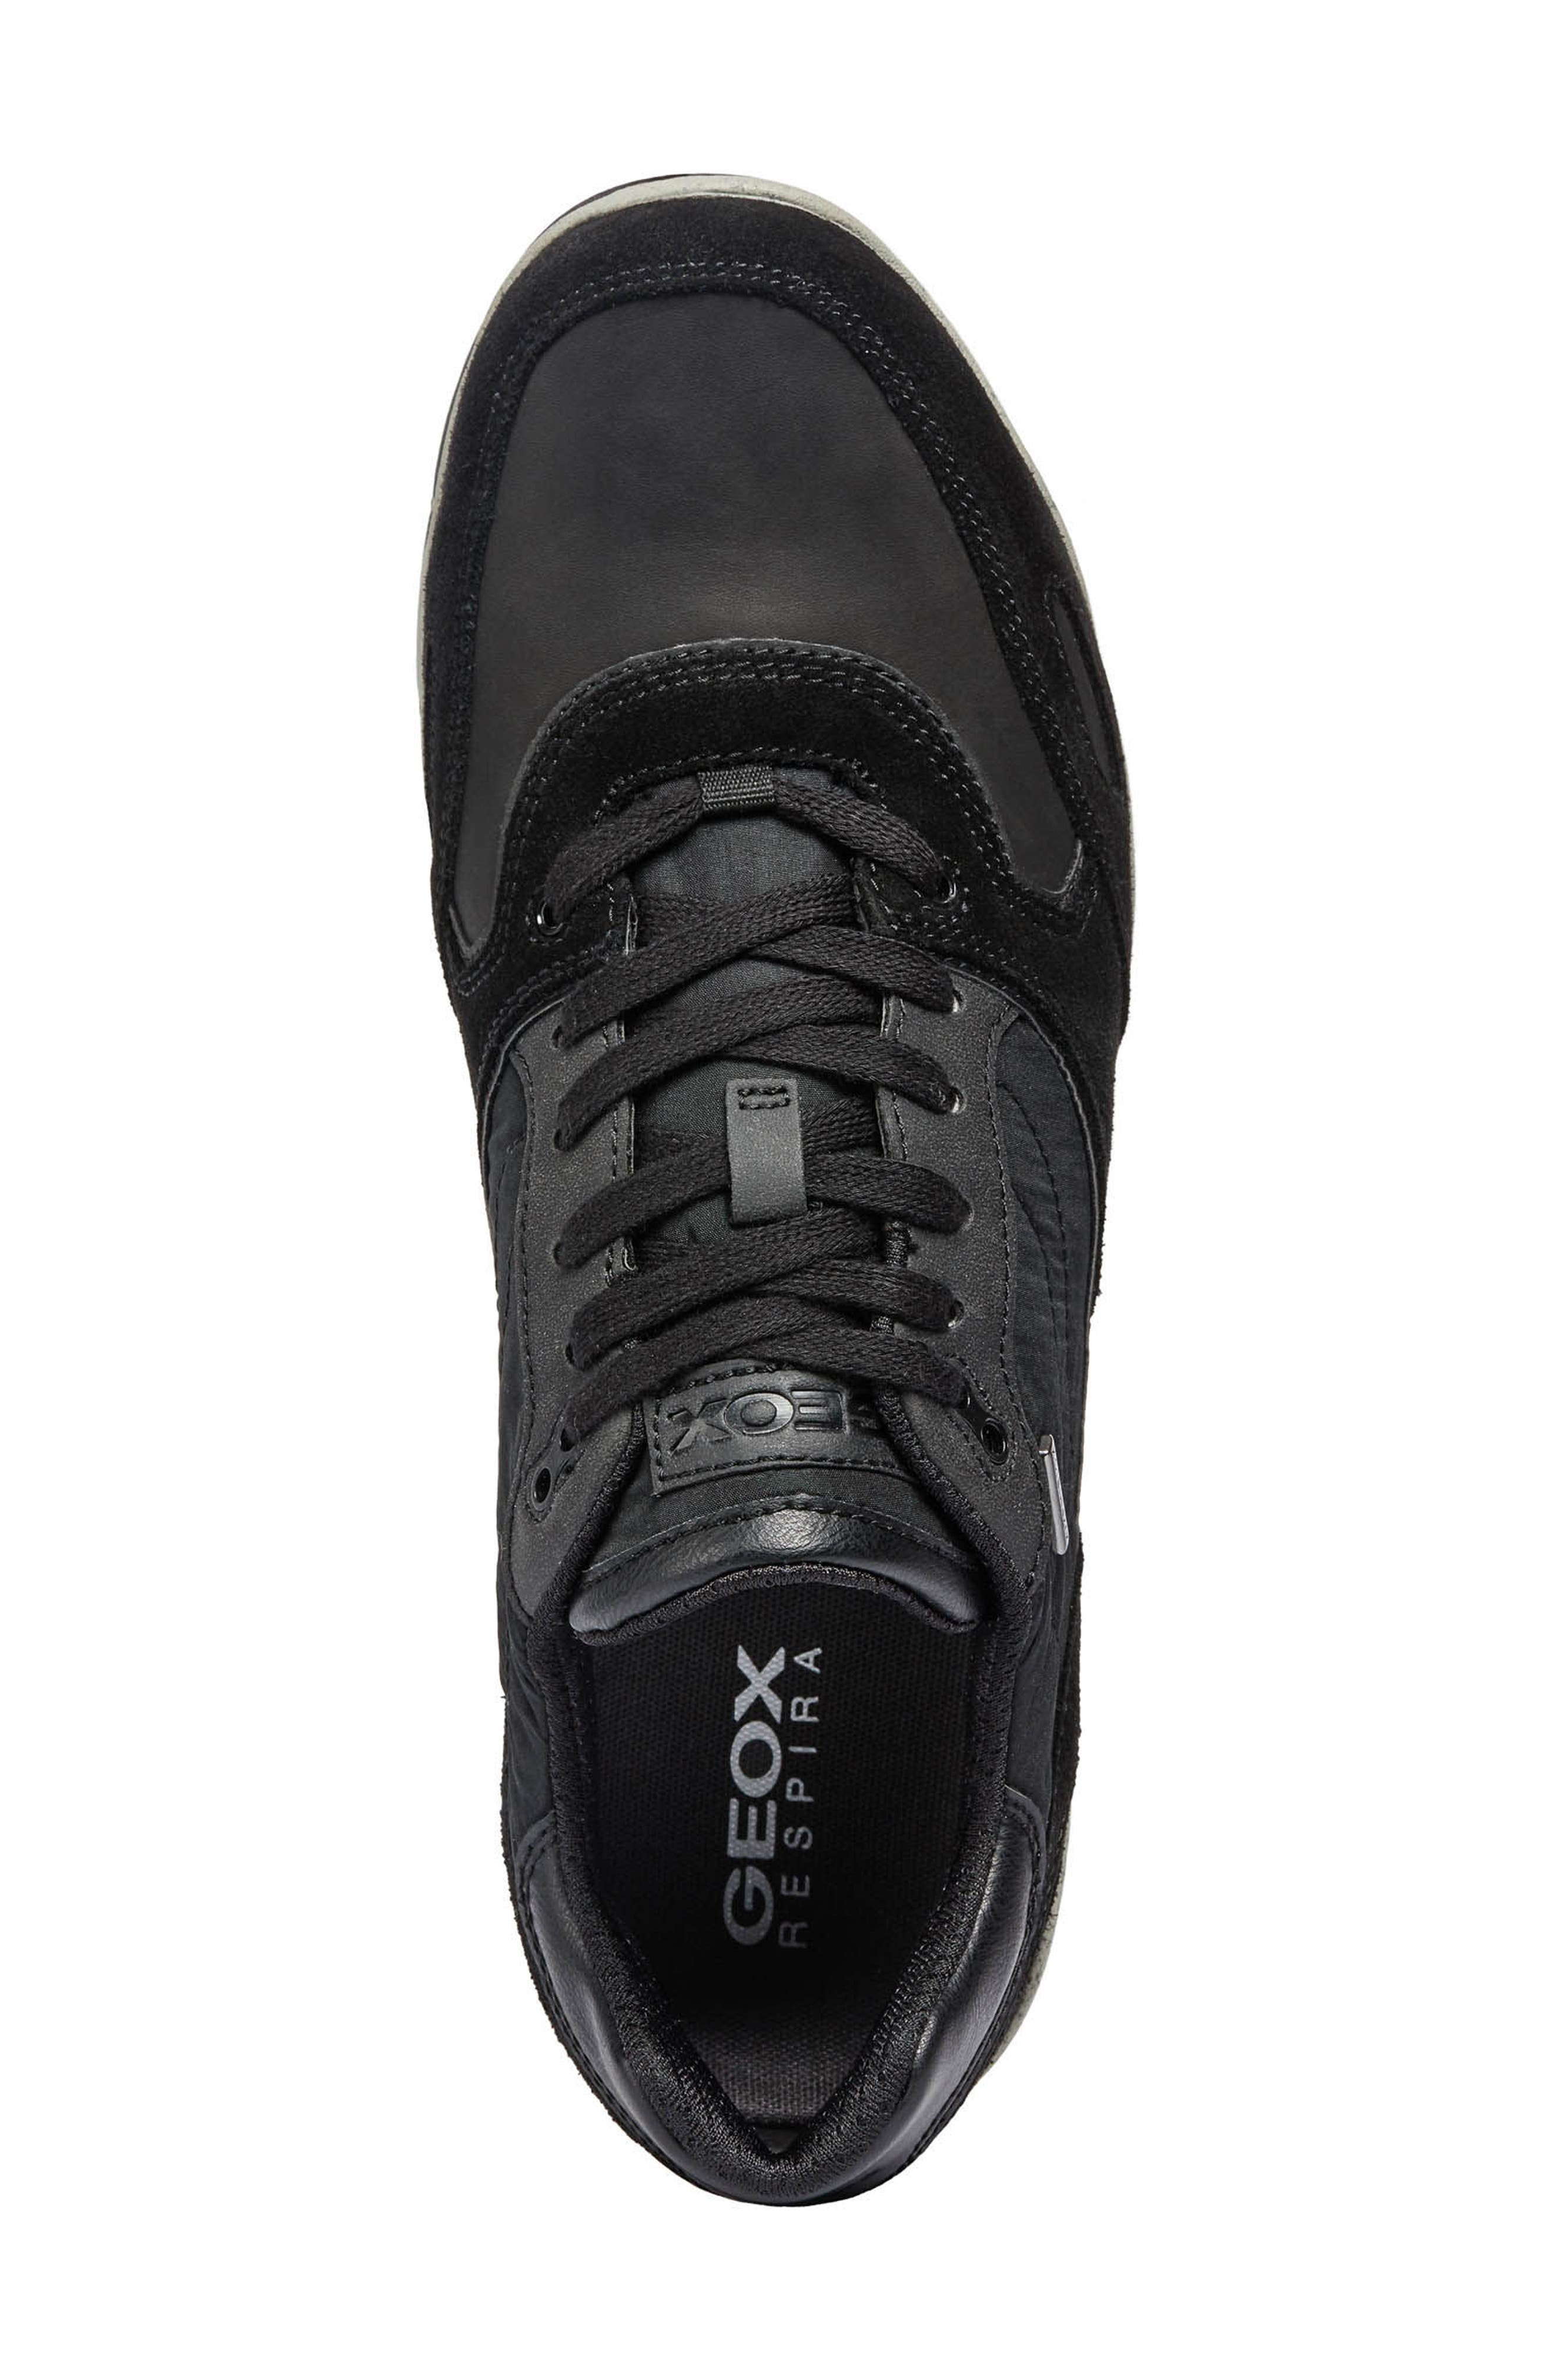 Sandro ABX Ambphibiox Waterproof Sneaker,                             Alternate thumbnail 5, color,                             007